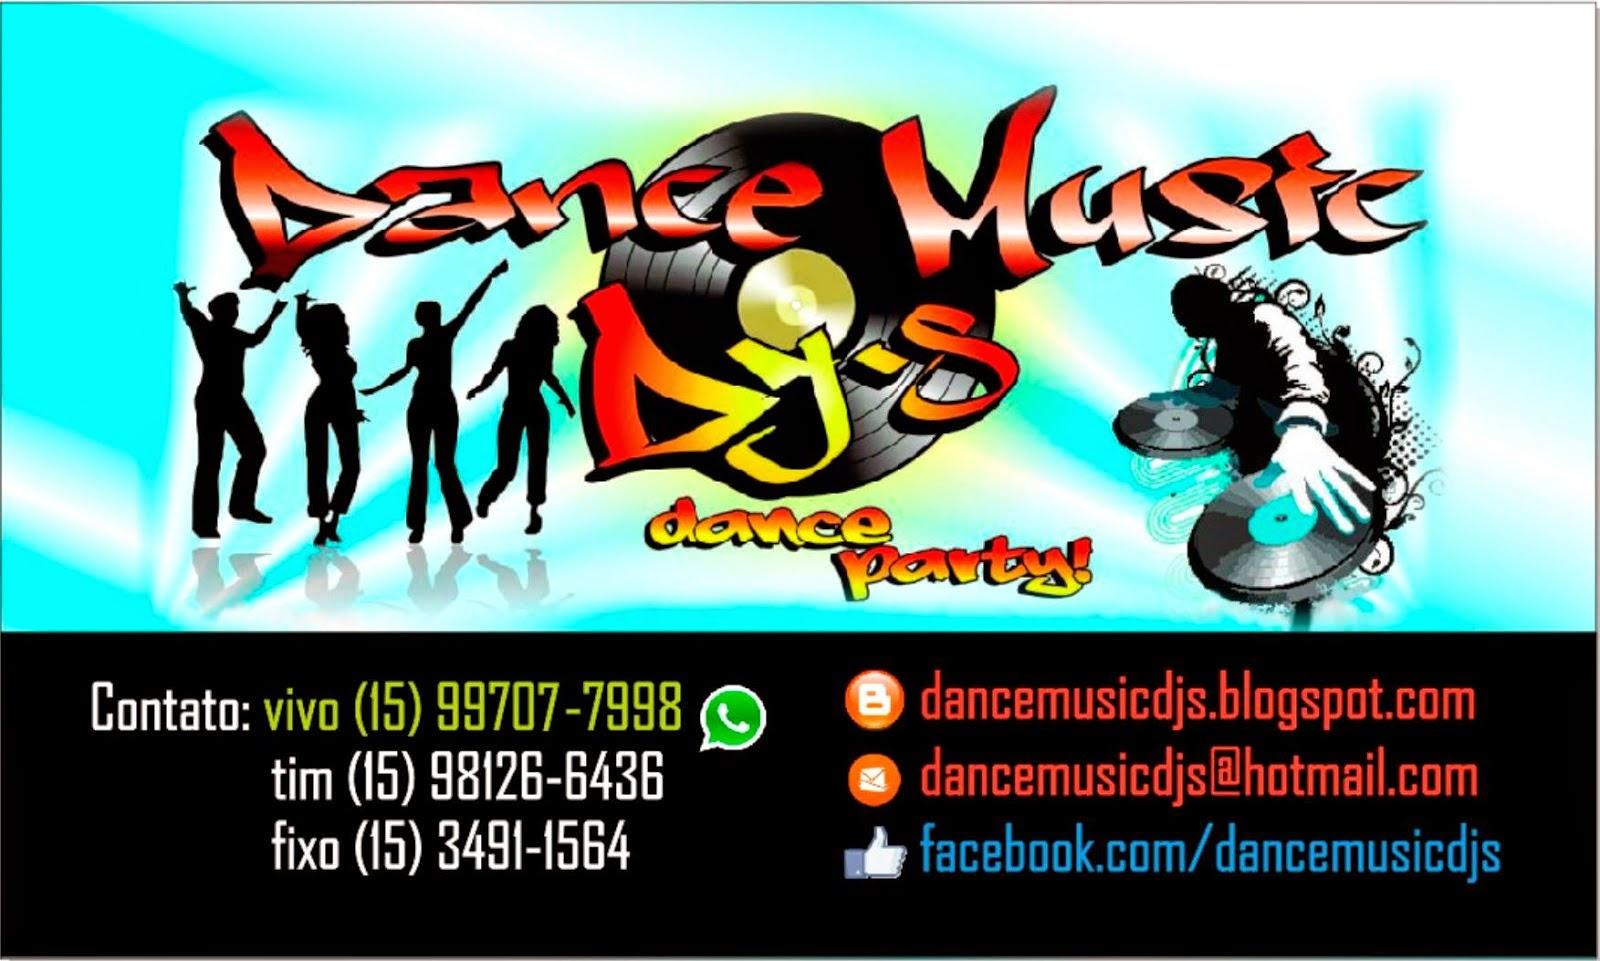 DANCE MUSIC DJ'S